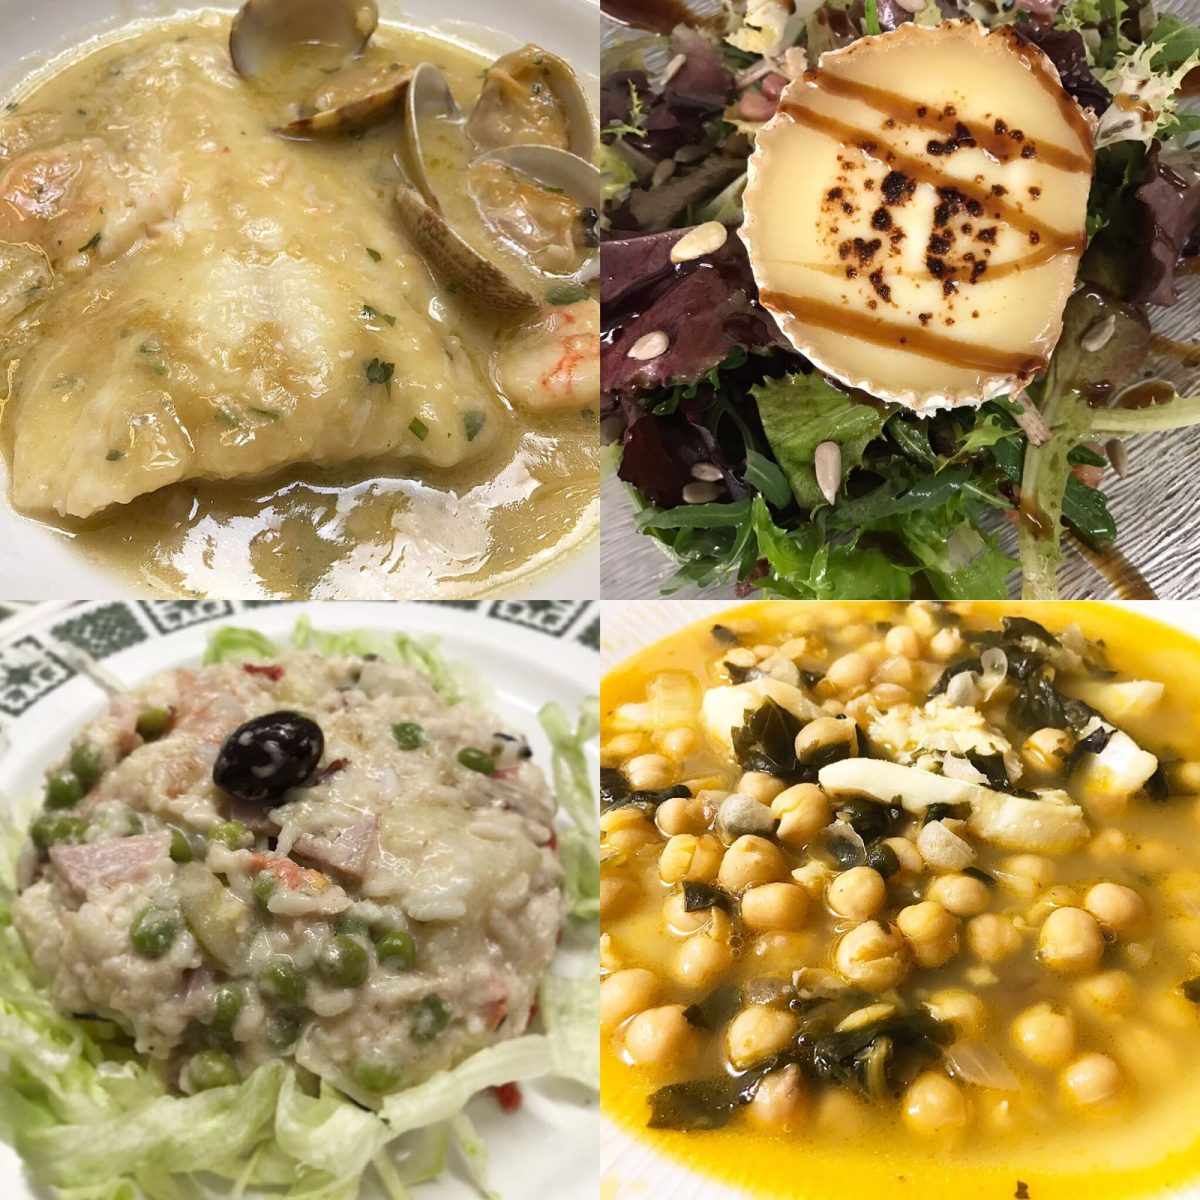 4-platos-garbanzos-ensalada-arroz-bacalao-rulo-1200x1200.jpg